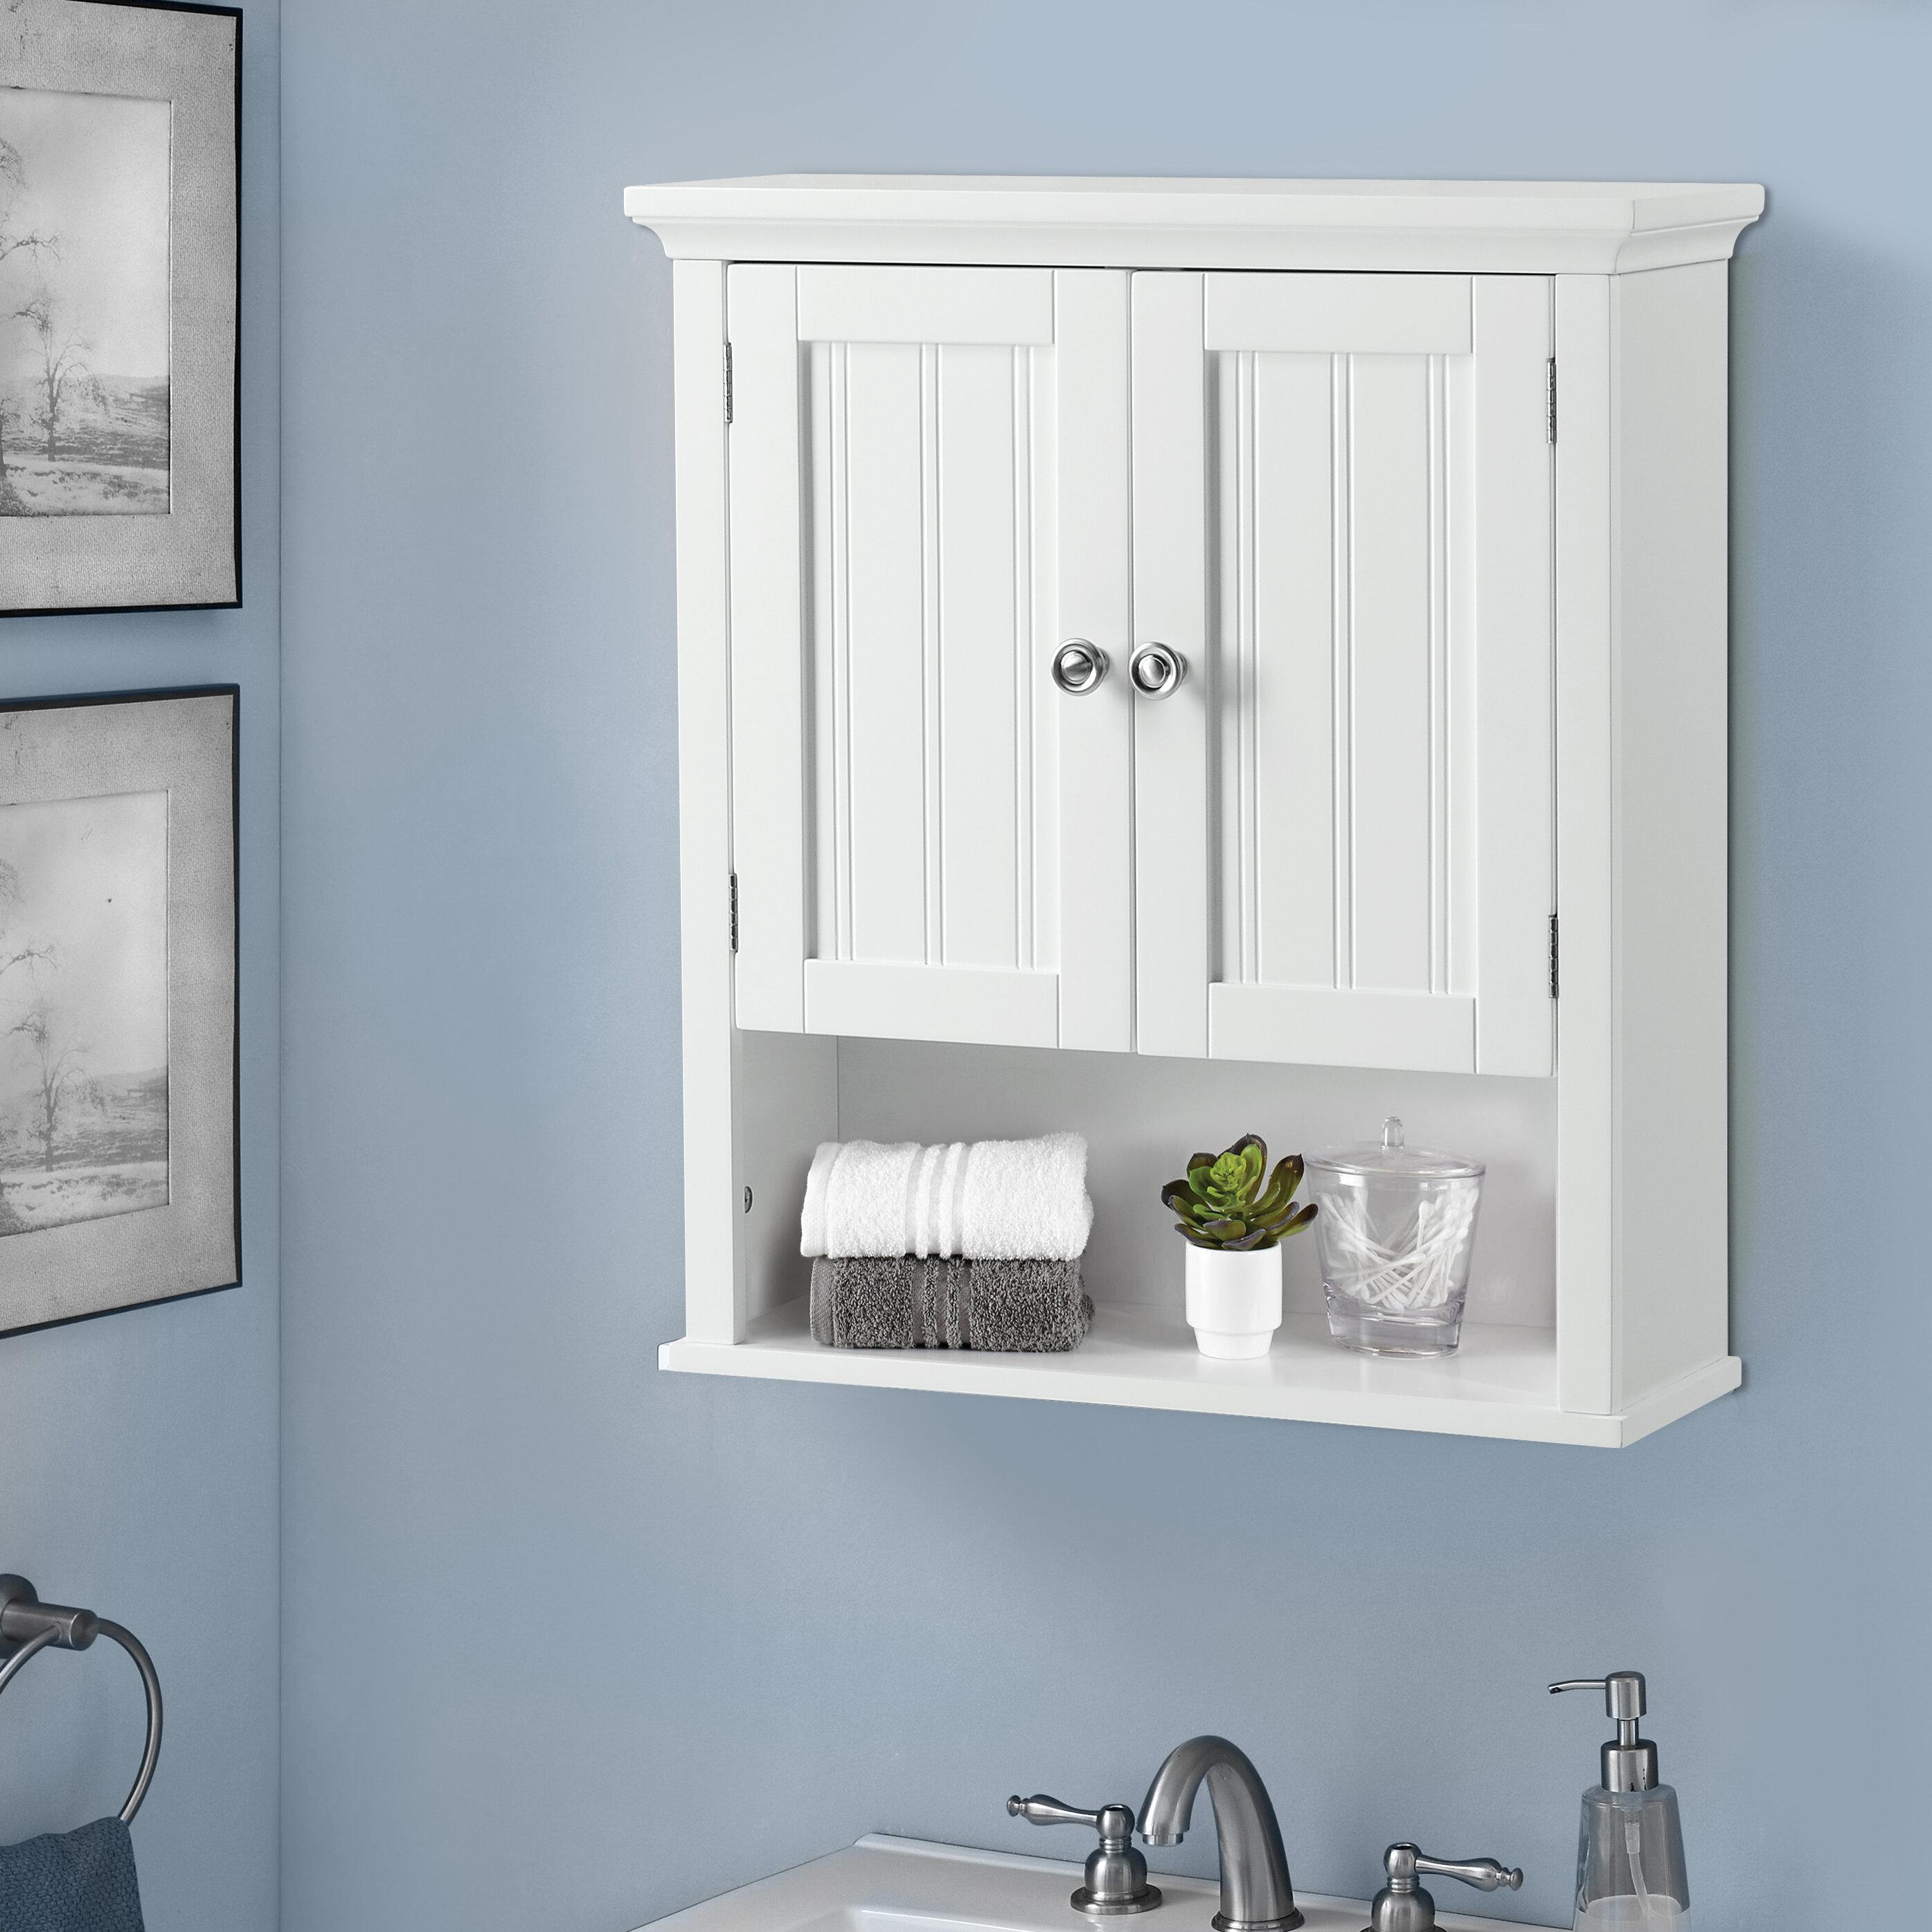 Bathroom Storage Cabinet Wall Mount Restroom Toiletry Organizer Cupboard Pantry